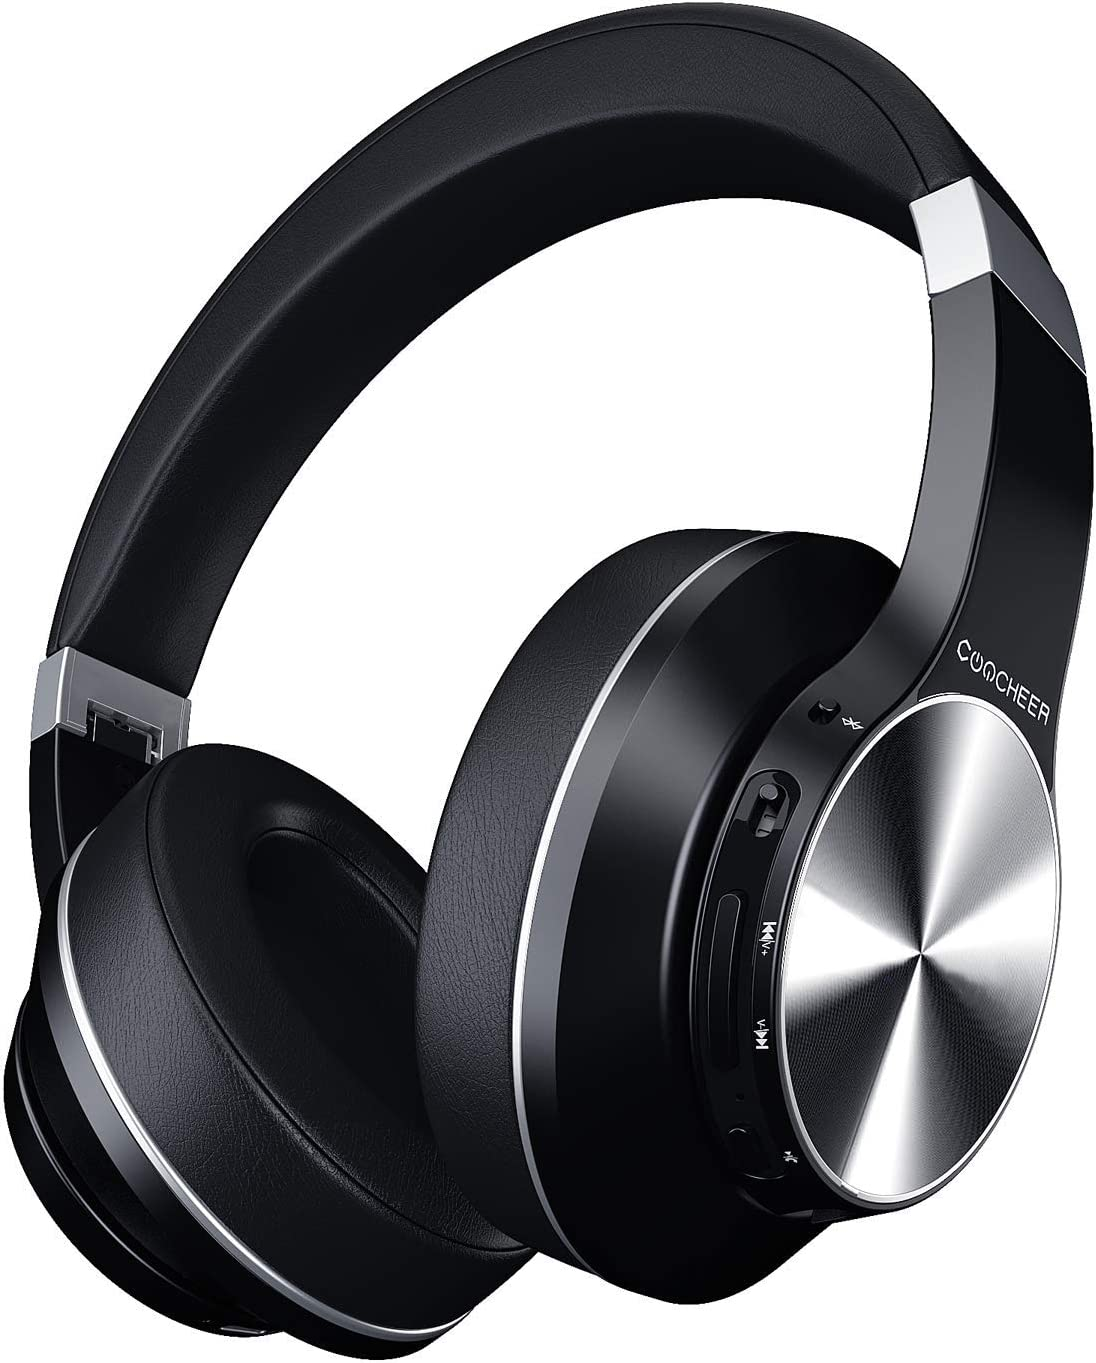 Active Cancelación de Ruido y Bluetooth, Auriculares Inalámbricos Auriculares Bluetooth con Micrófono Hi-Fi Deep Bass para iOS, Android, Computadora y TV